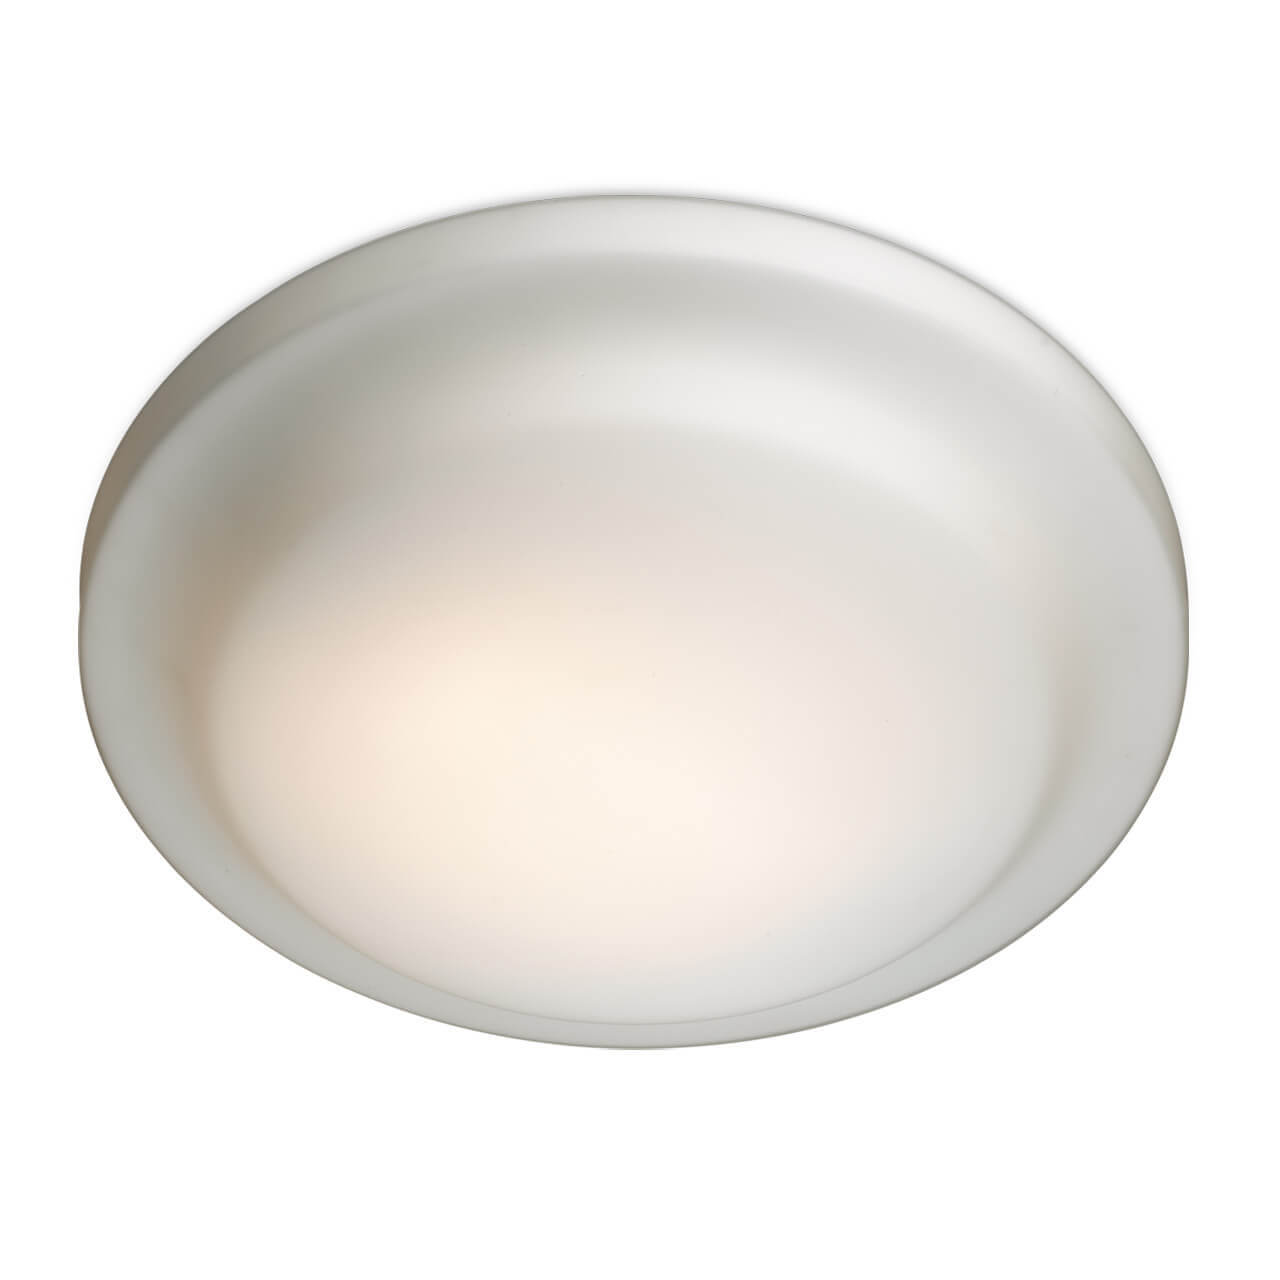 цена Светильник Odeon Light 2760/2C Drops онлайн в 2017 году